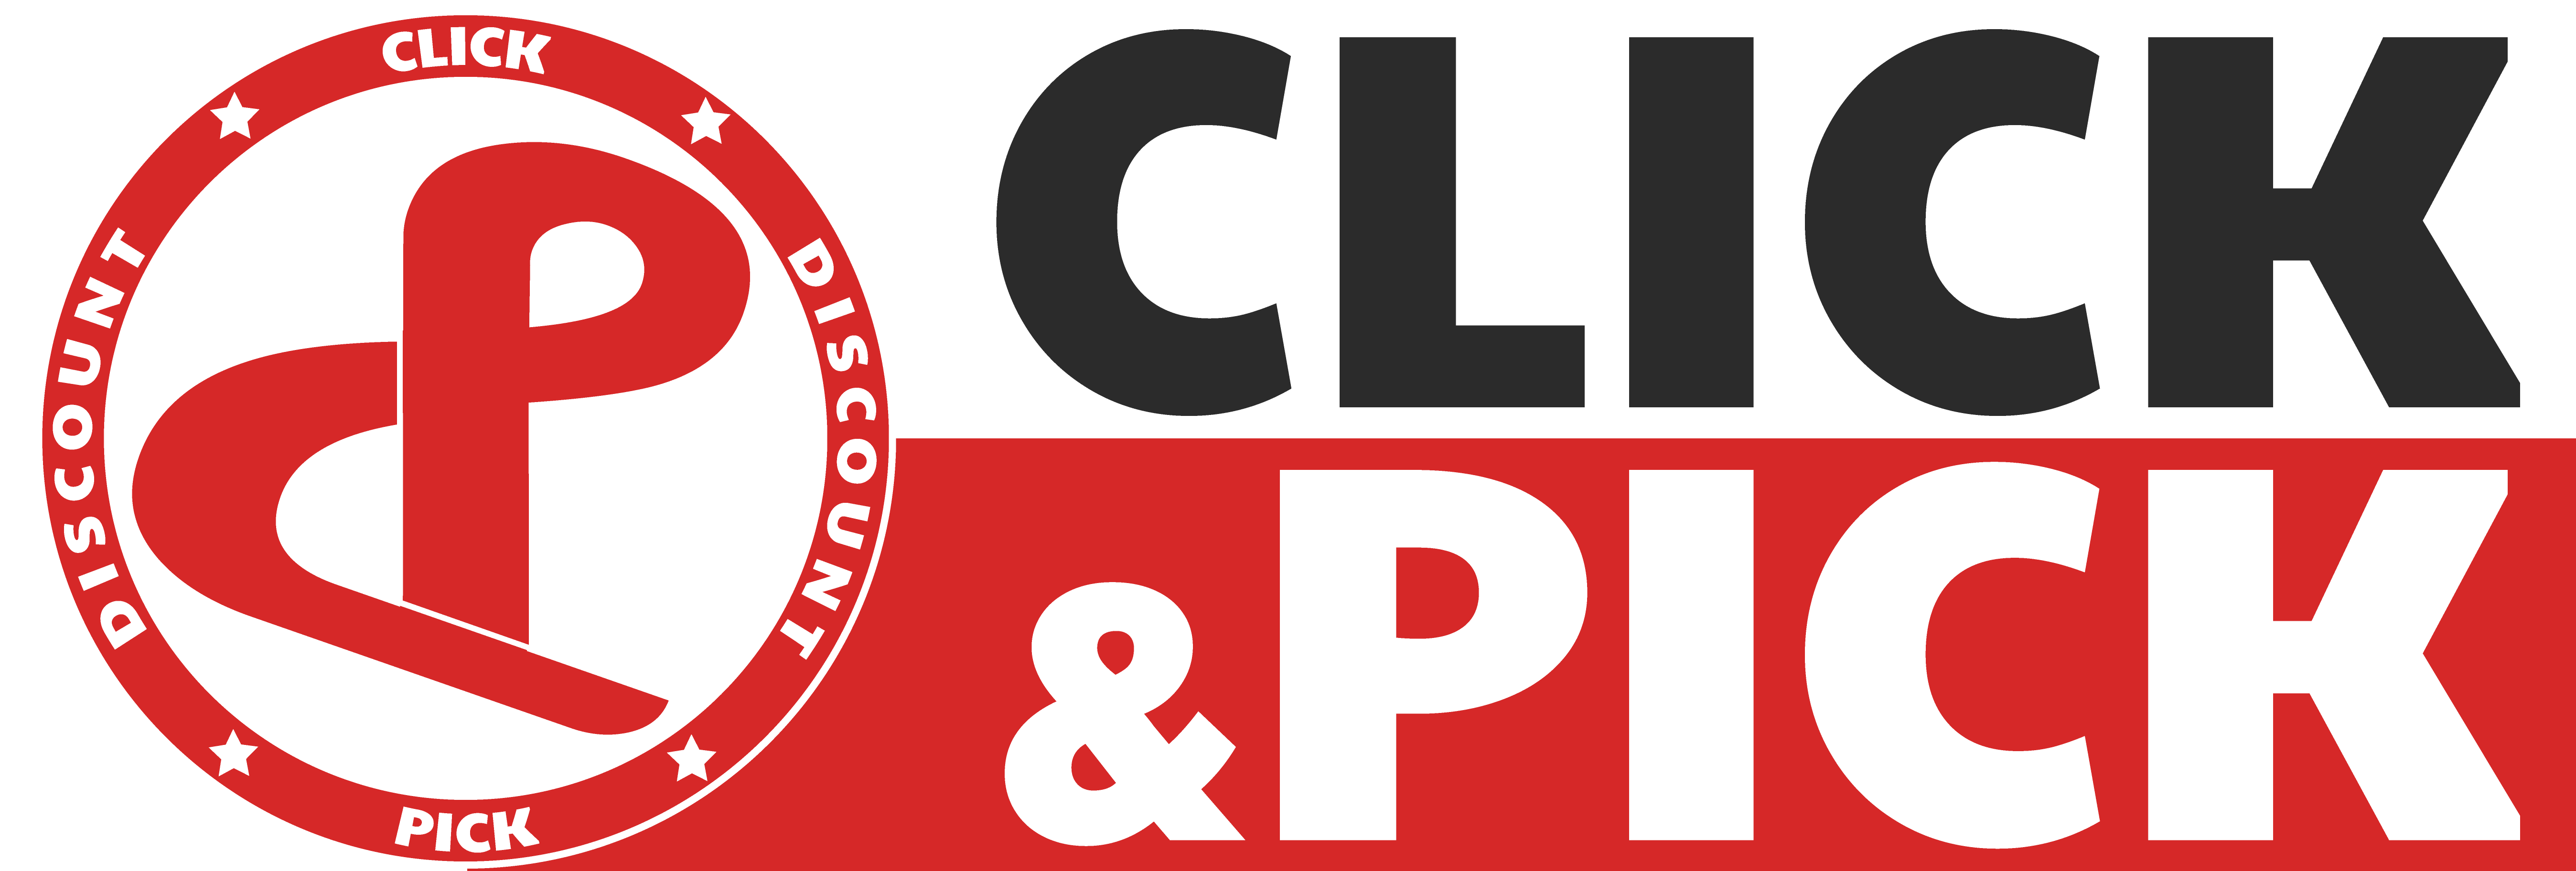 logo_2_red_full.png